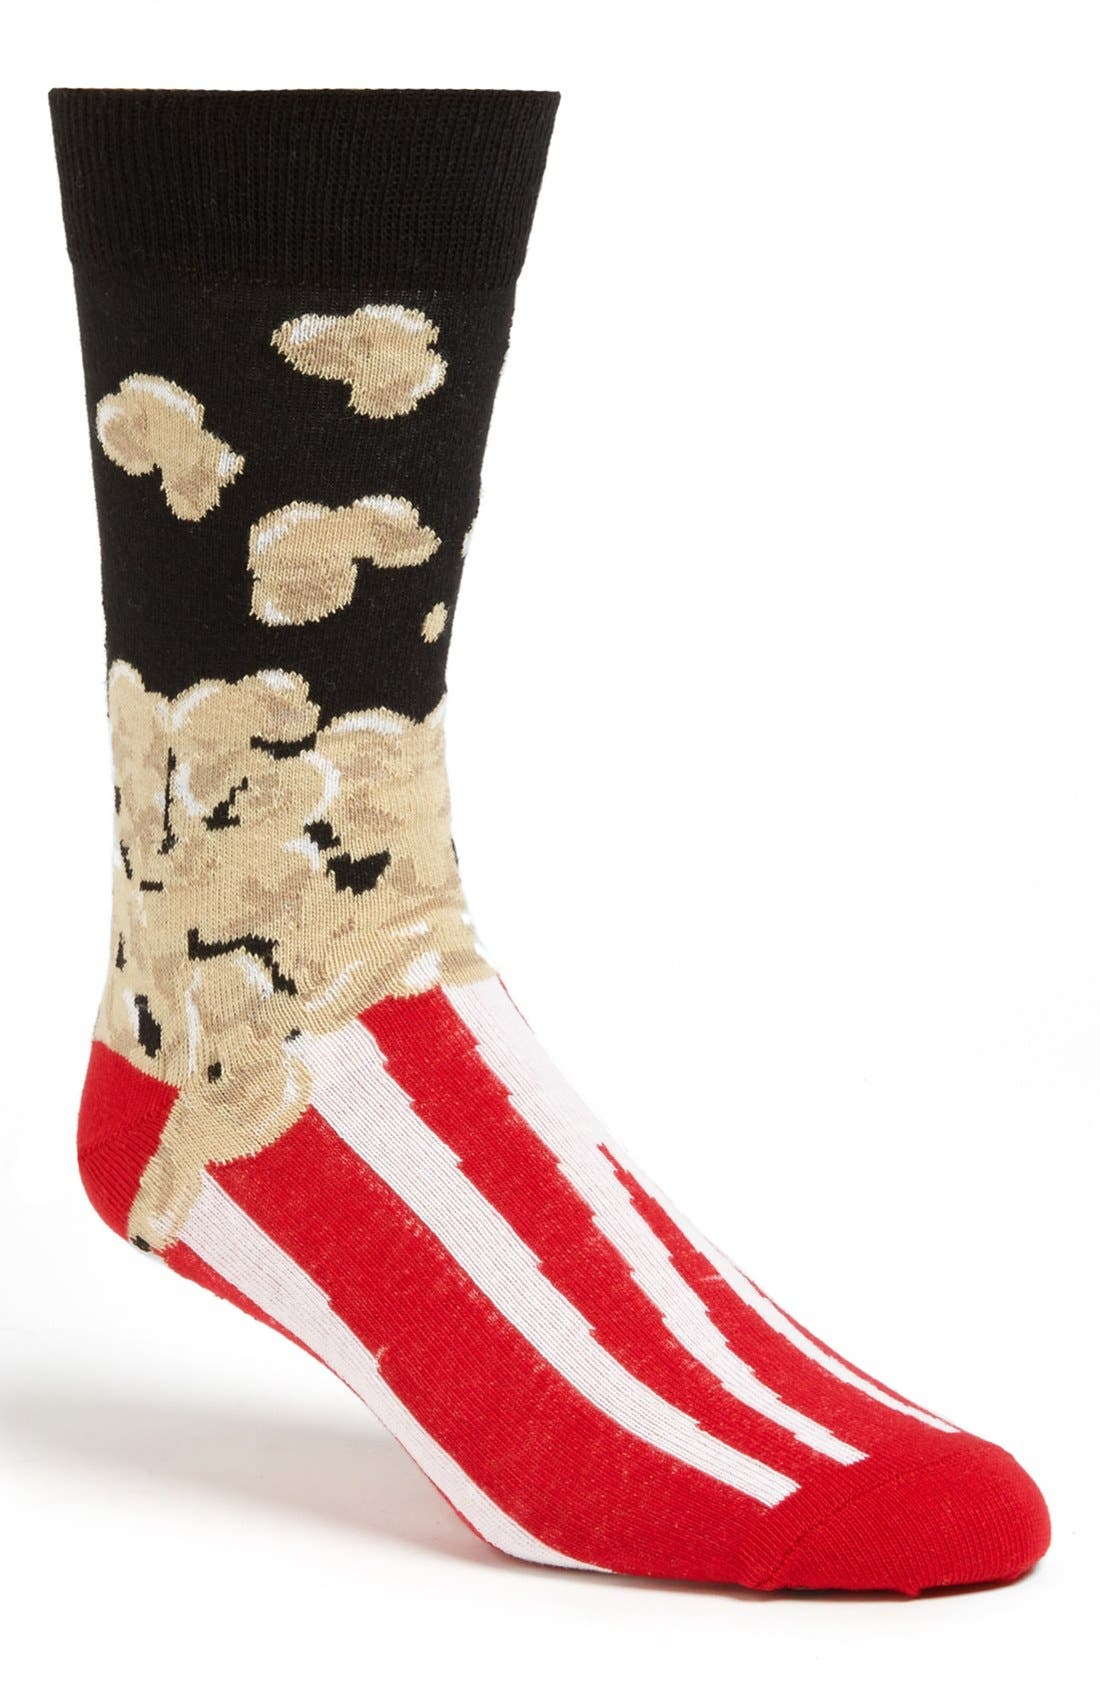 Alternate Image 1 Selected - Topman Popcorn Box Socks